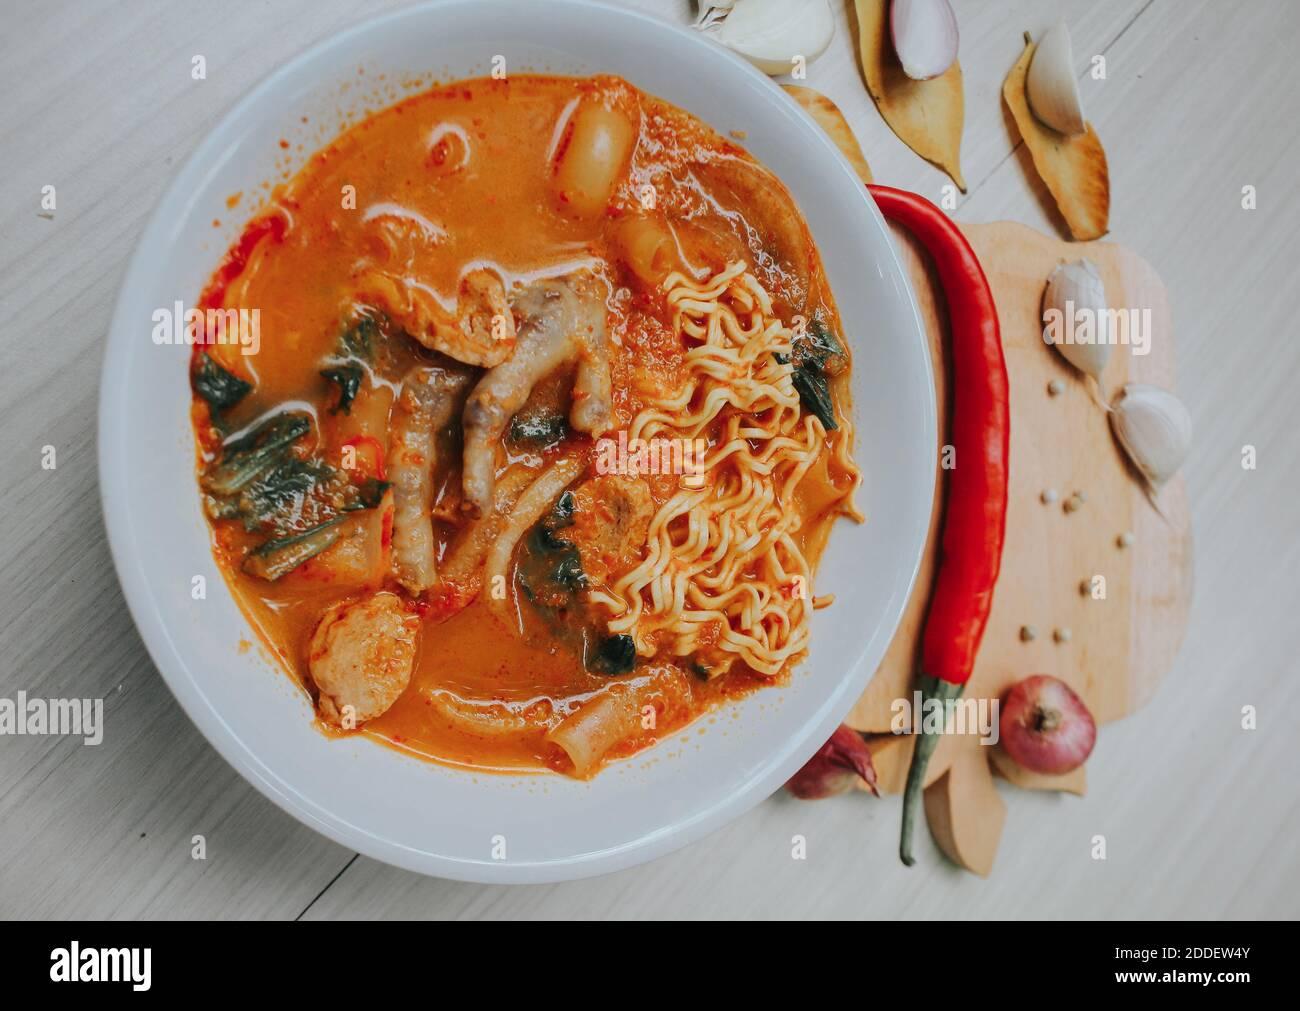 Seblak High Resolution Stock Photography And Images Alamy